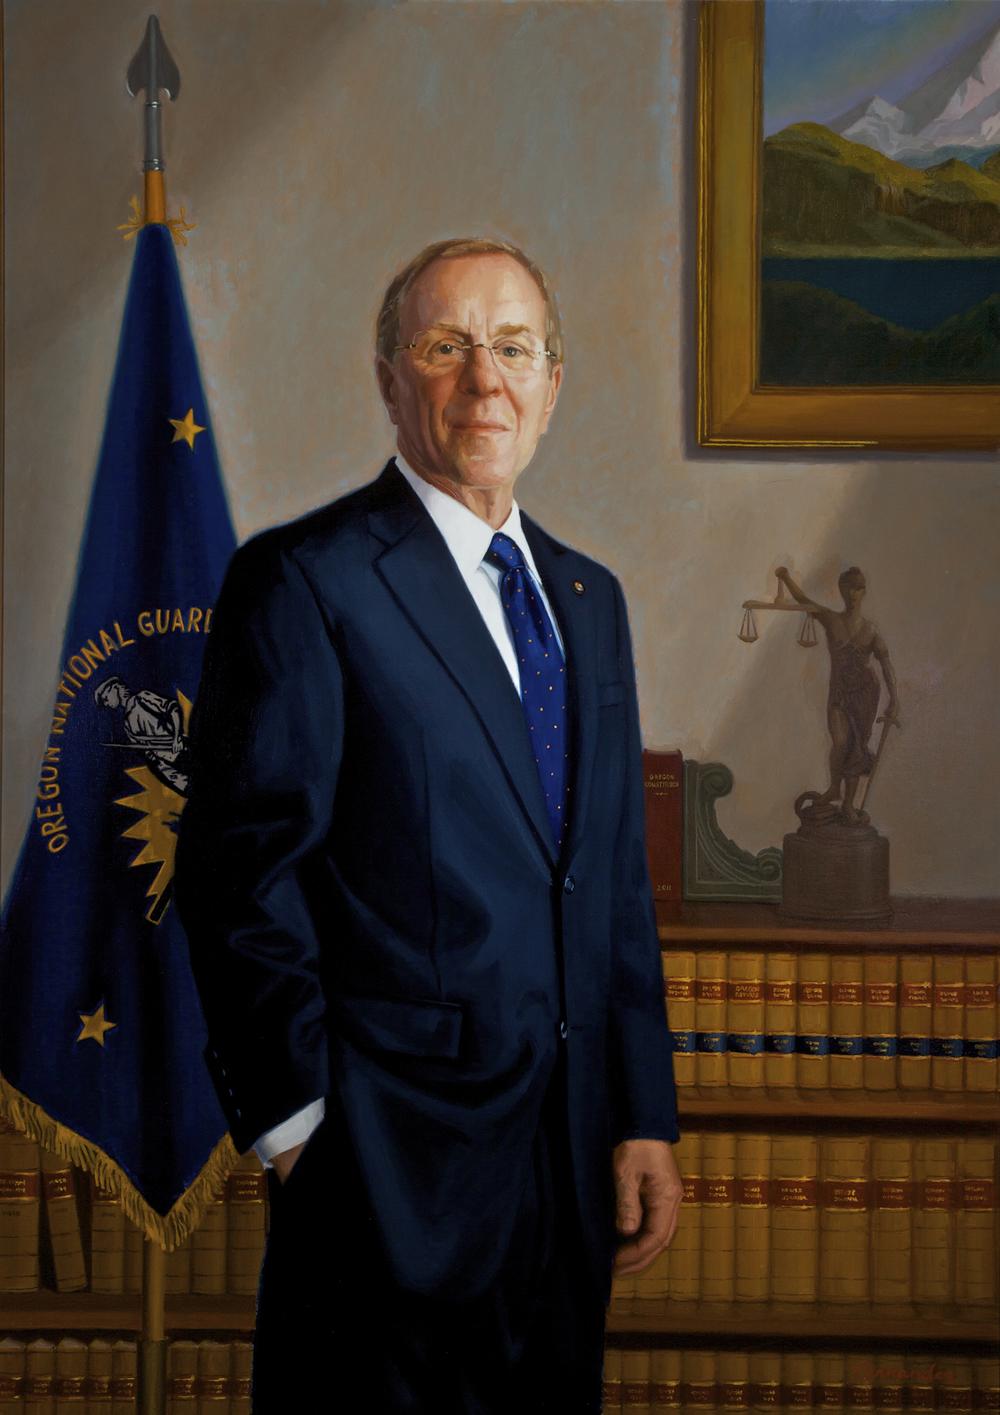 Official Portrait of Oregon Governor Ted Kulongoski